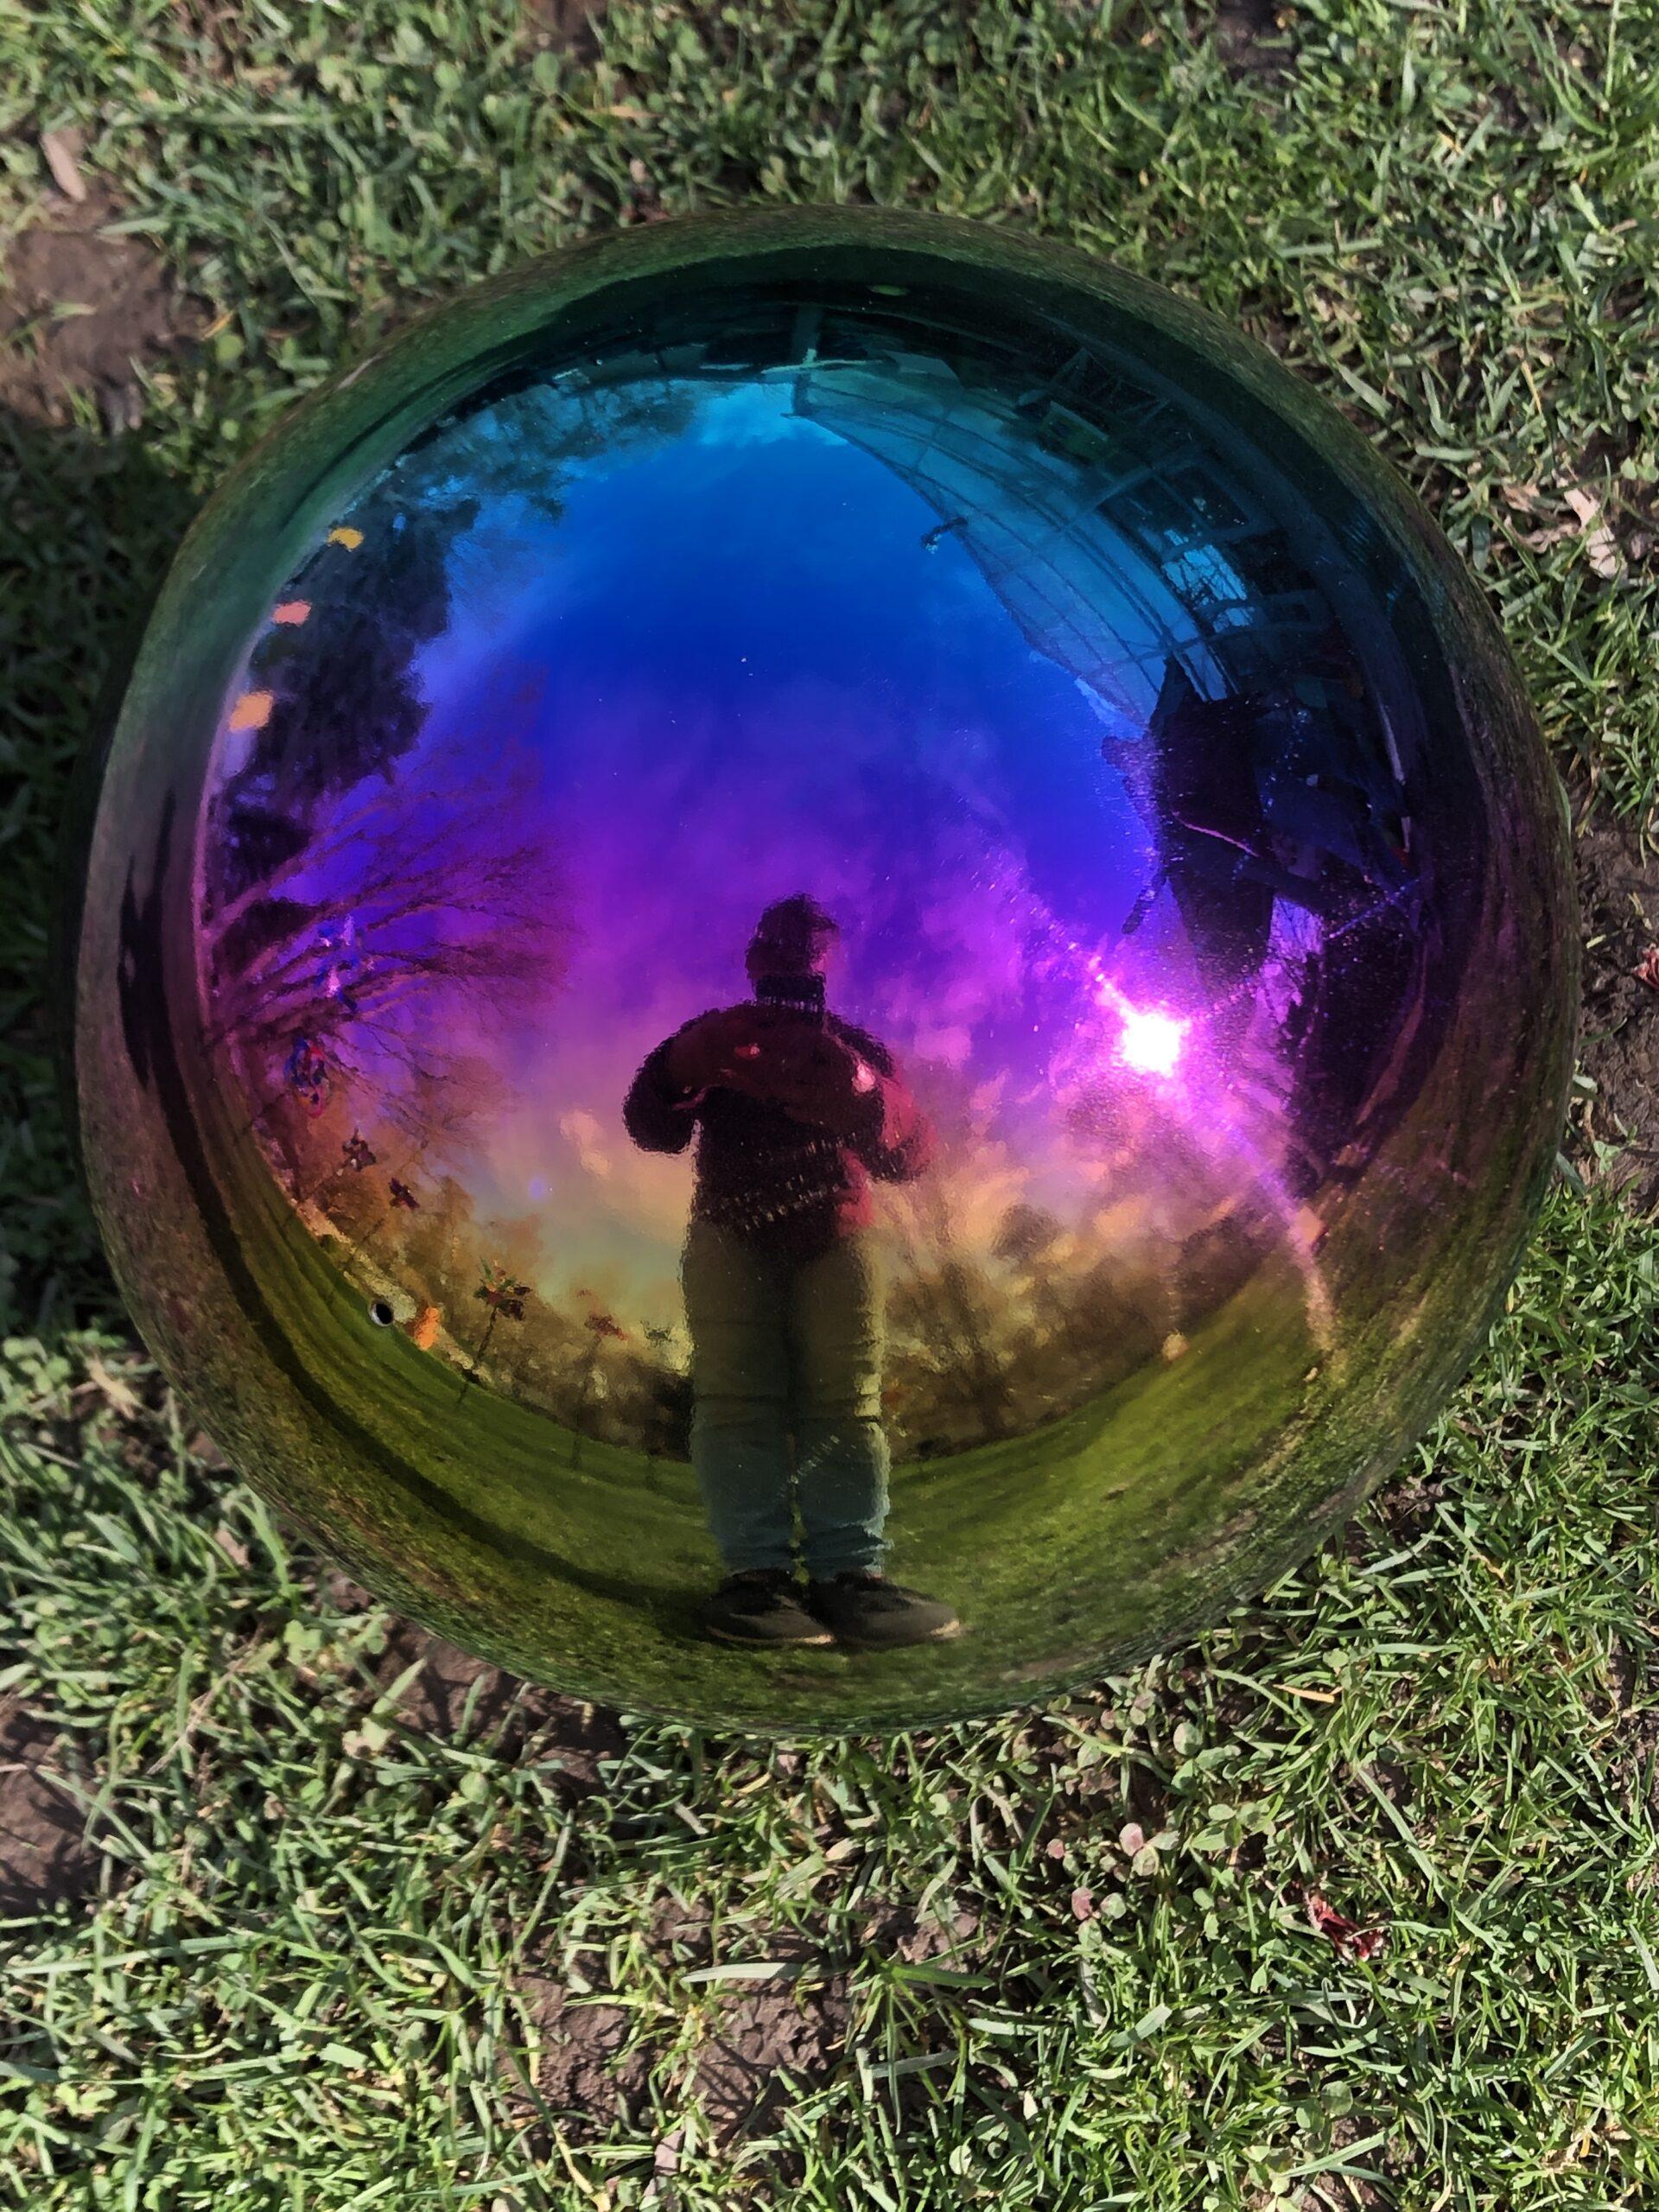 Stainless Steel Gazing Ball Ballantyne Gardens